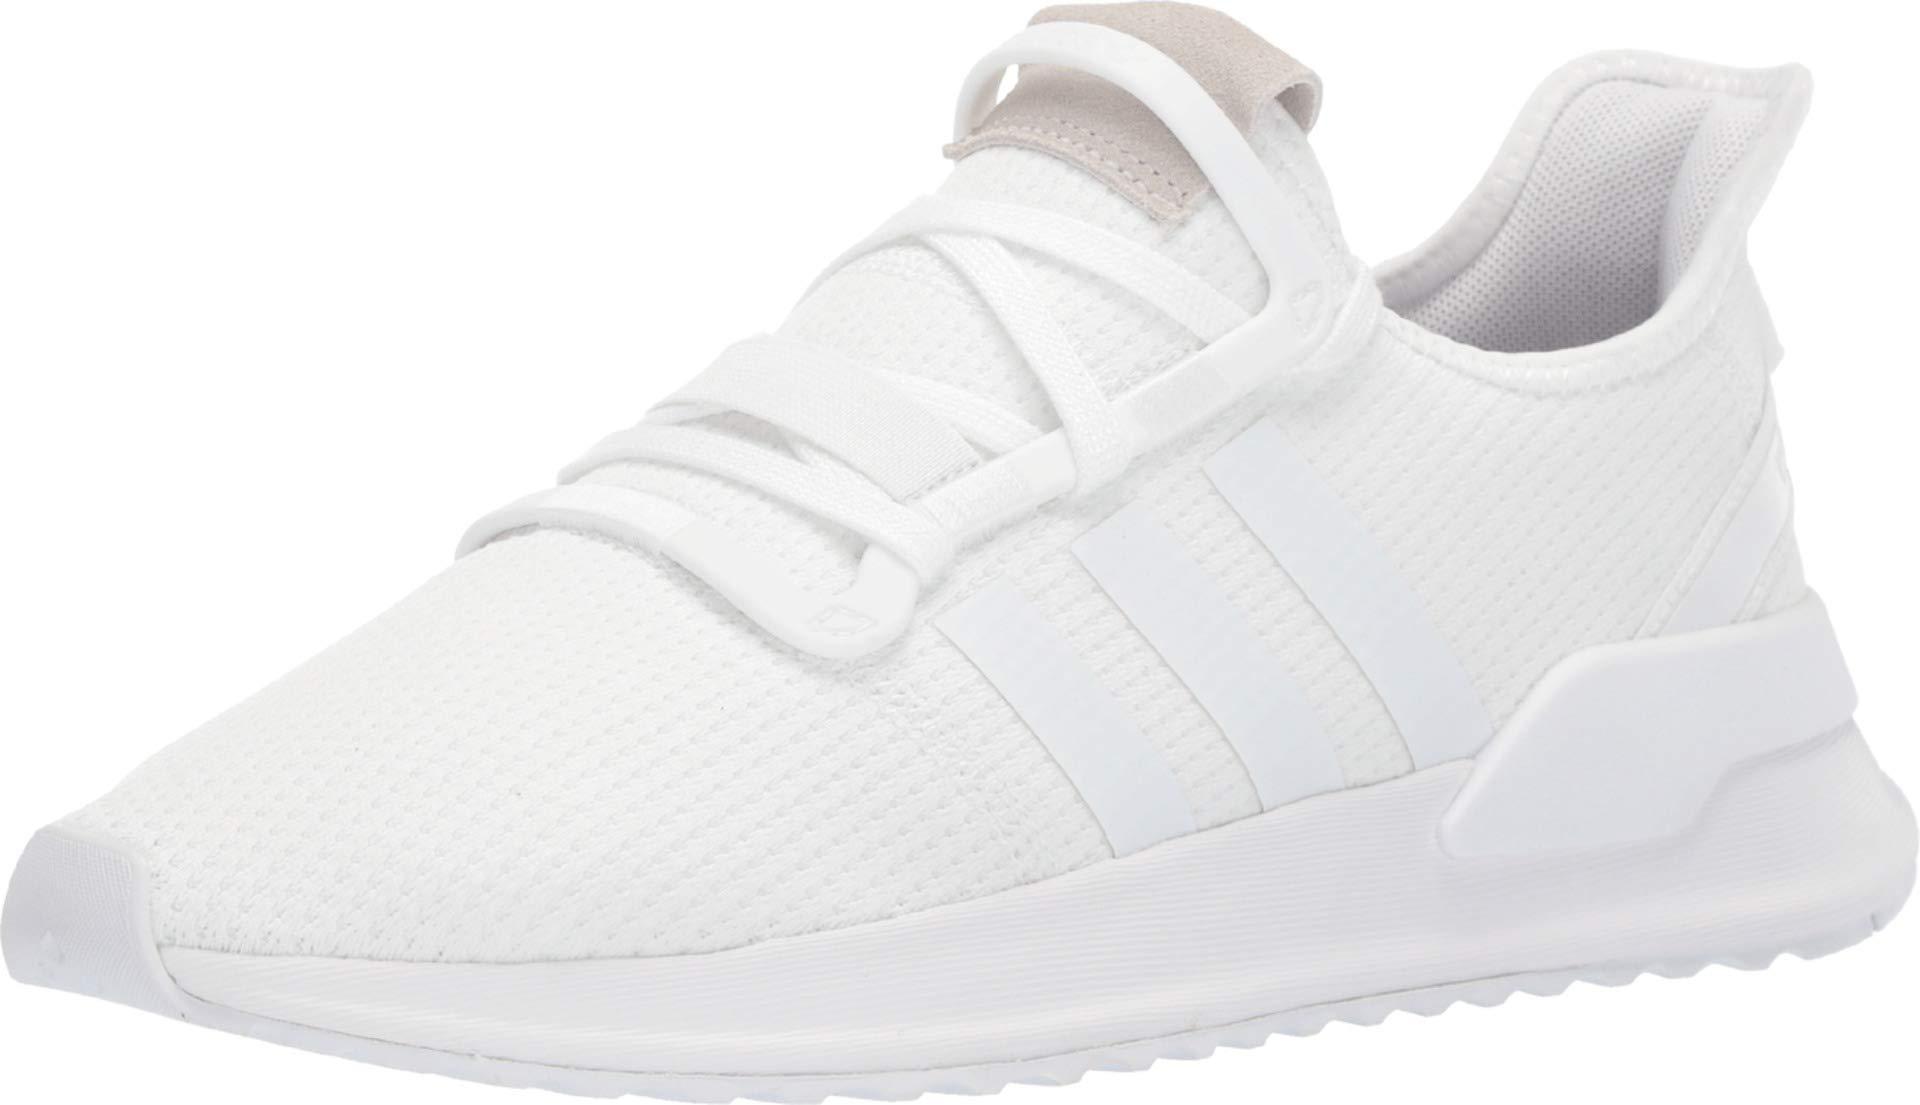 adidas Originals Rubber U_path Run - Shoes in White/White/Black ...